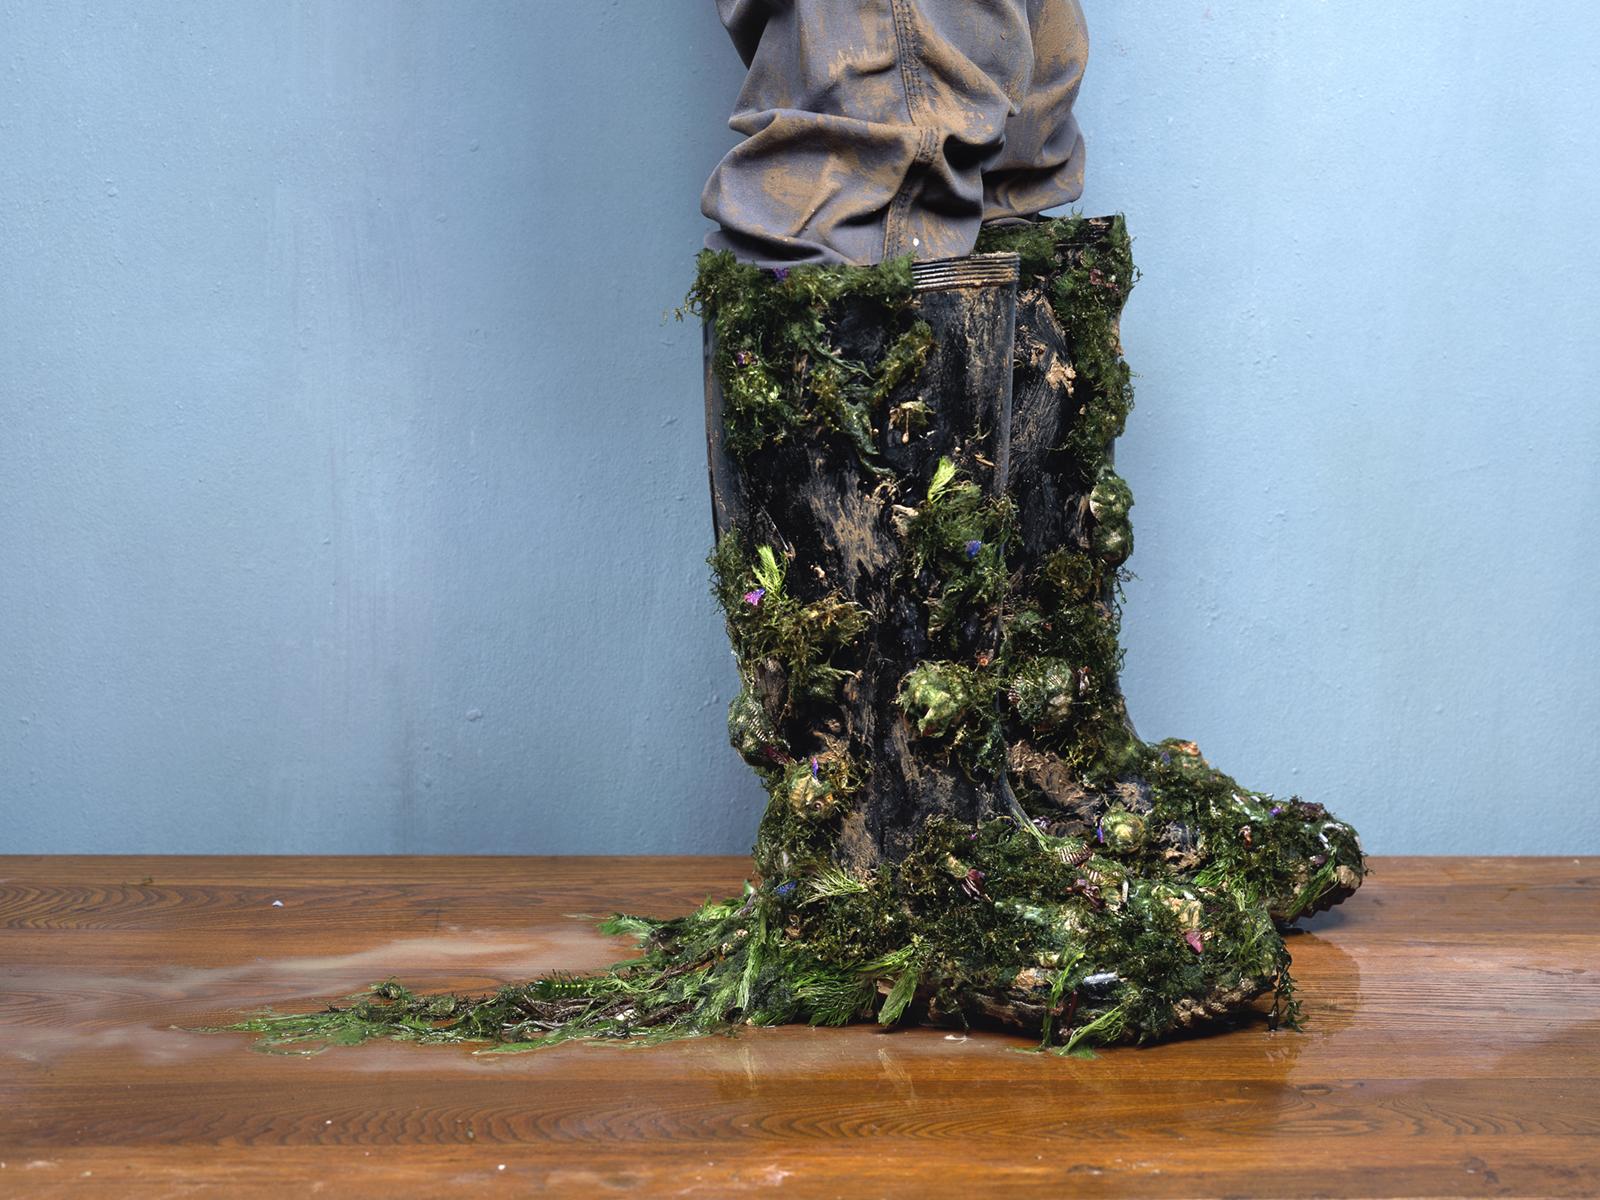 Chen Wei 陈维, Wading Boots, 2010, Archival inkjet print 收藏级艺术微喷, 75 x 100 cm